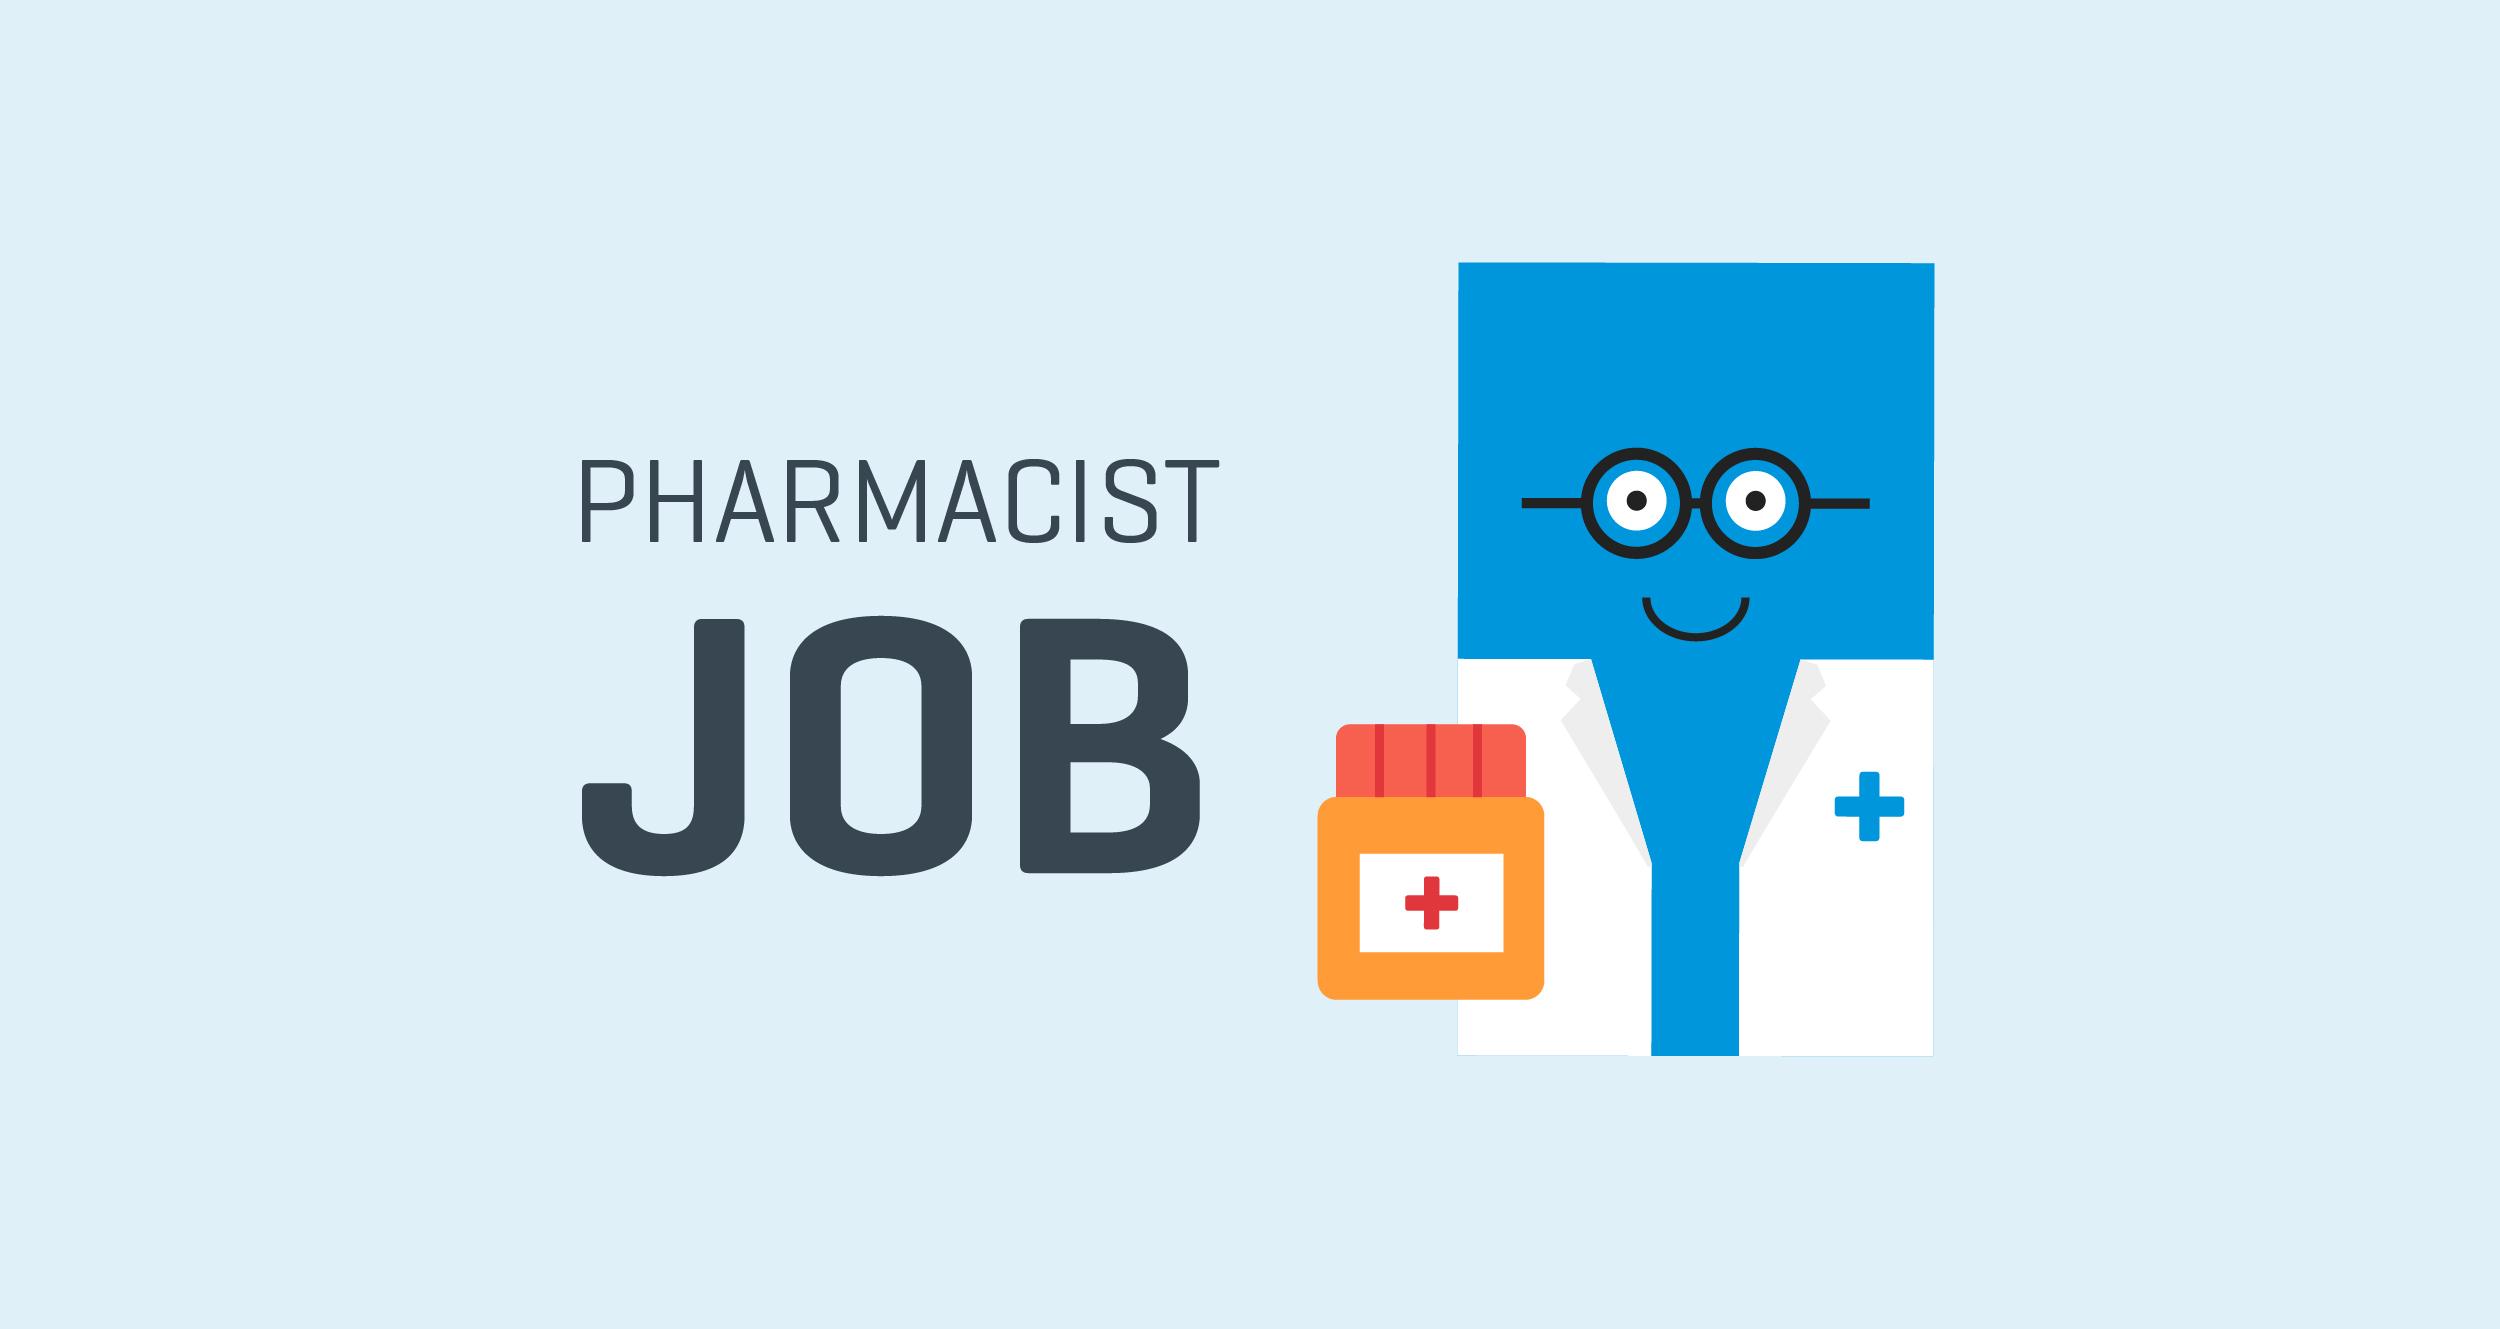 pharmacists Job|pharmacist job|pharmacist job|Pharmacist jobs in Egypt.